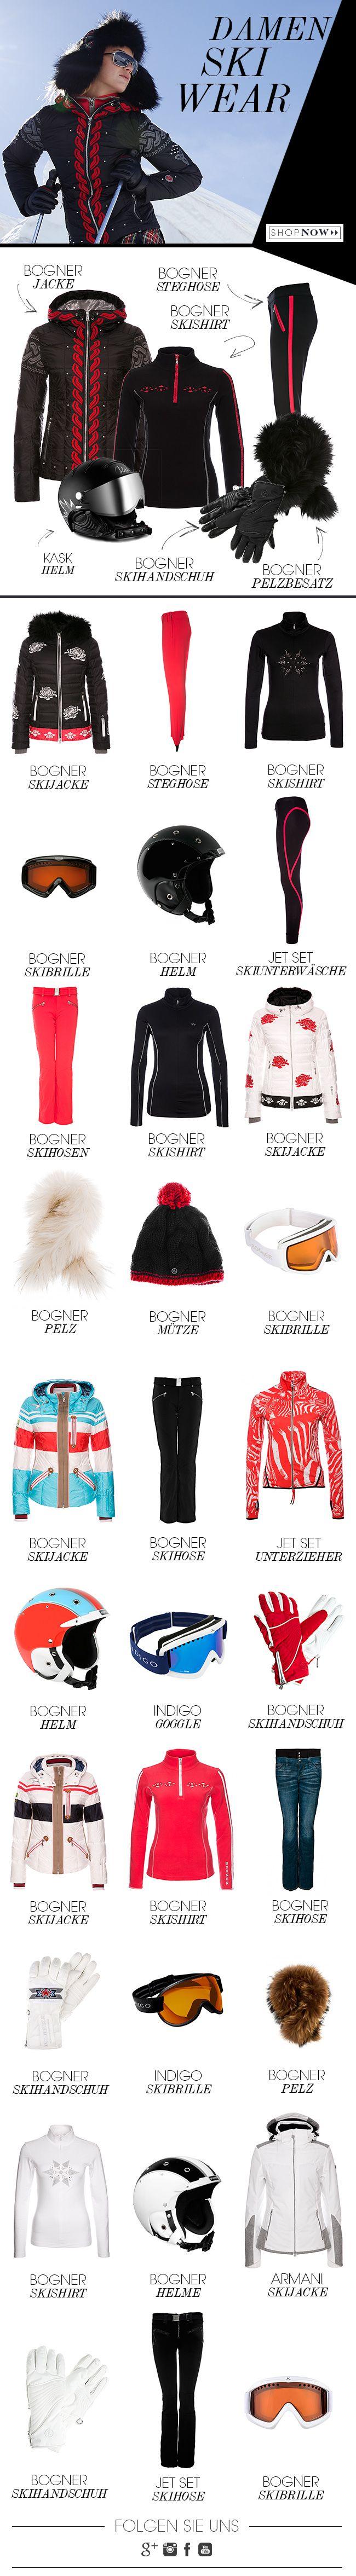 #newsletter #stylenews #damen #herren #sailerstyle #onlineshop #trusted #fashion #highfashion #bogner #ski #skiwear #skijacke #indigo #skihose